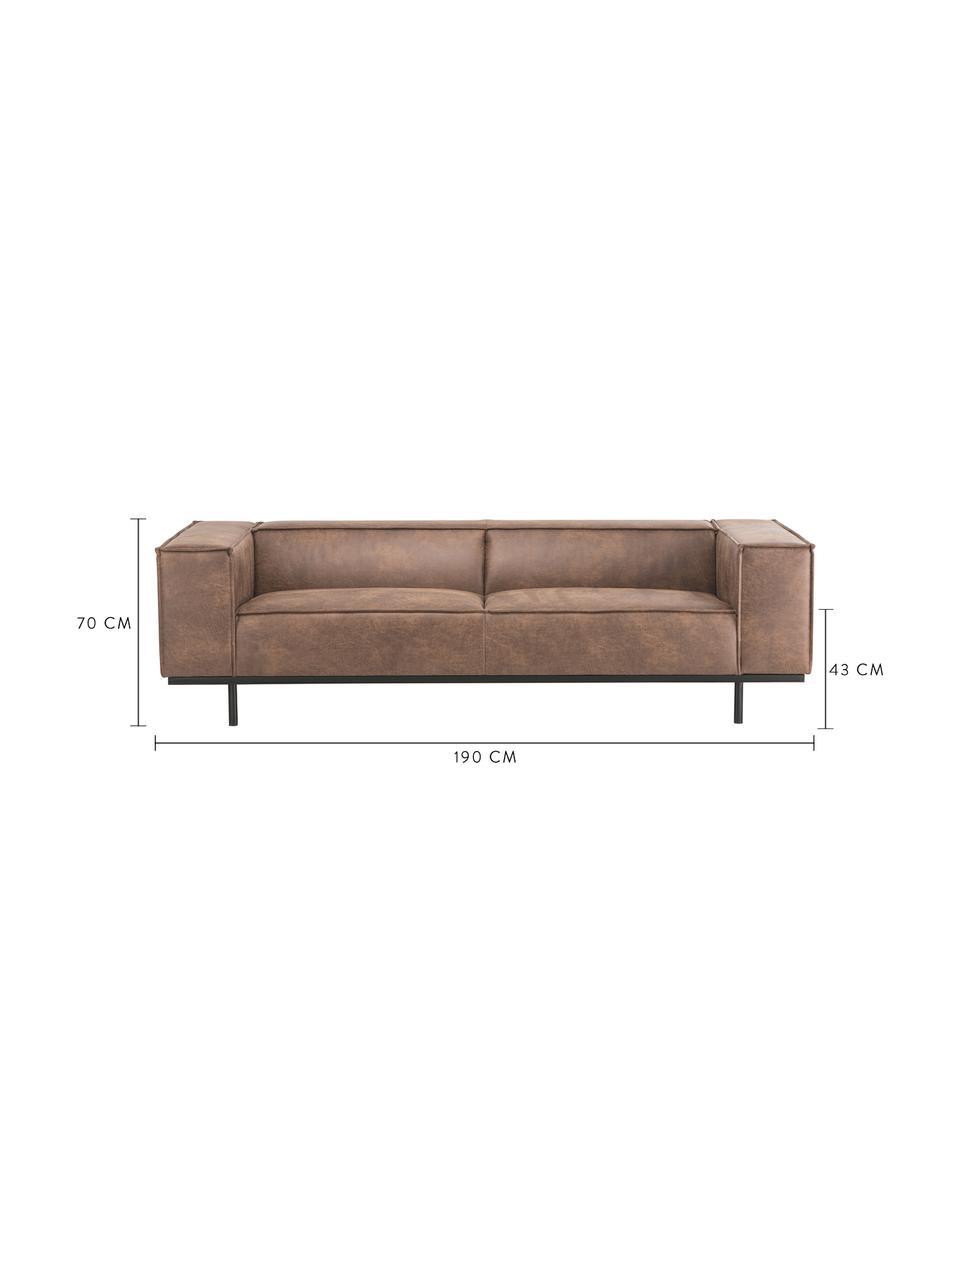 Canapé 2places cuir Abigail, Cuir brun